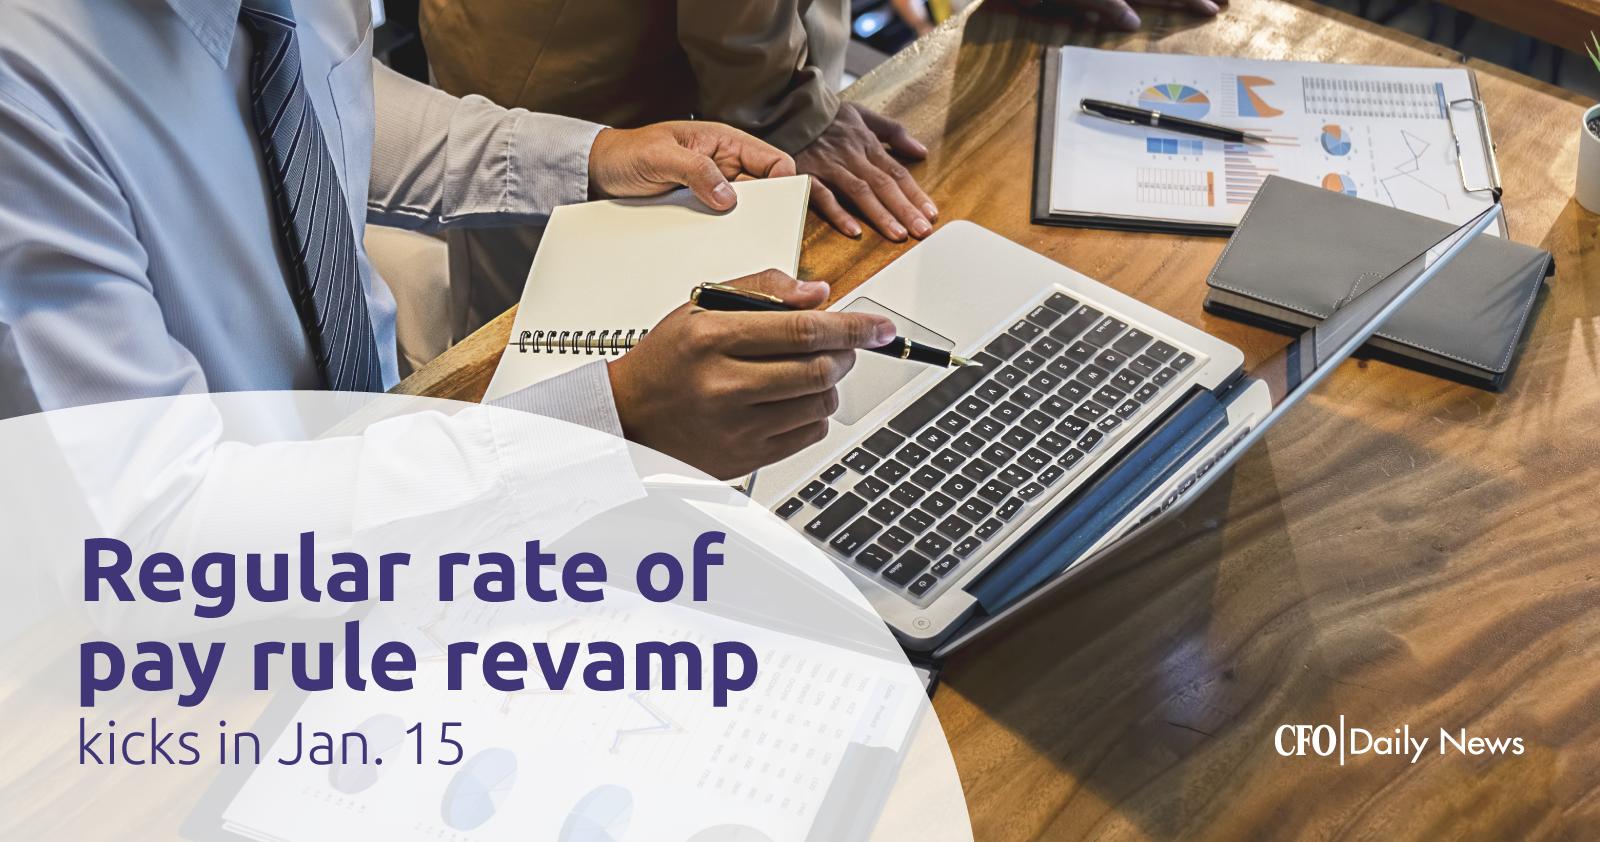 Regular rate of pay rule revamp